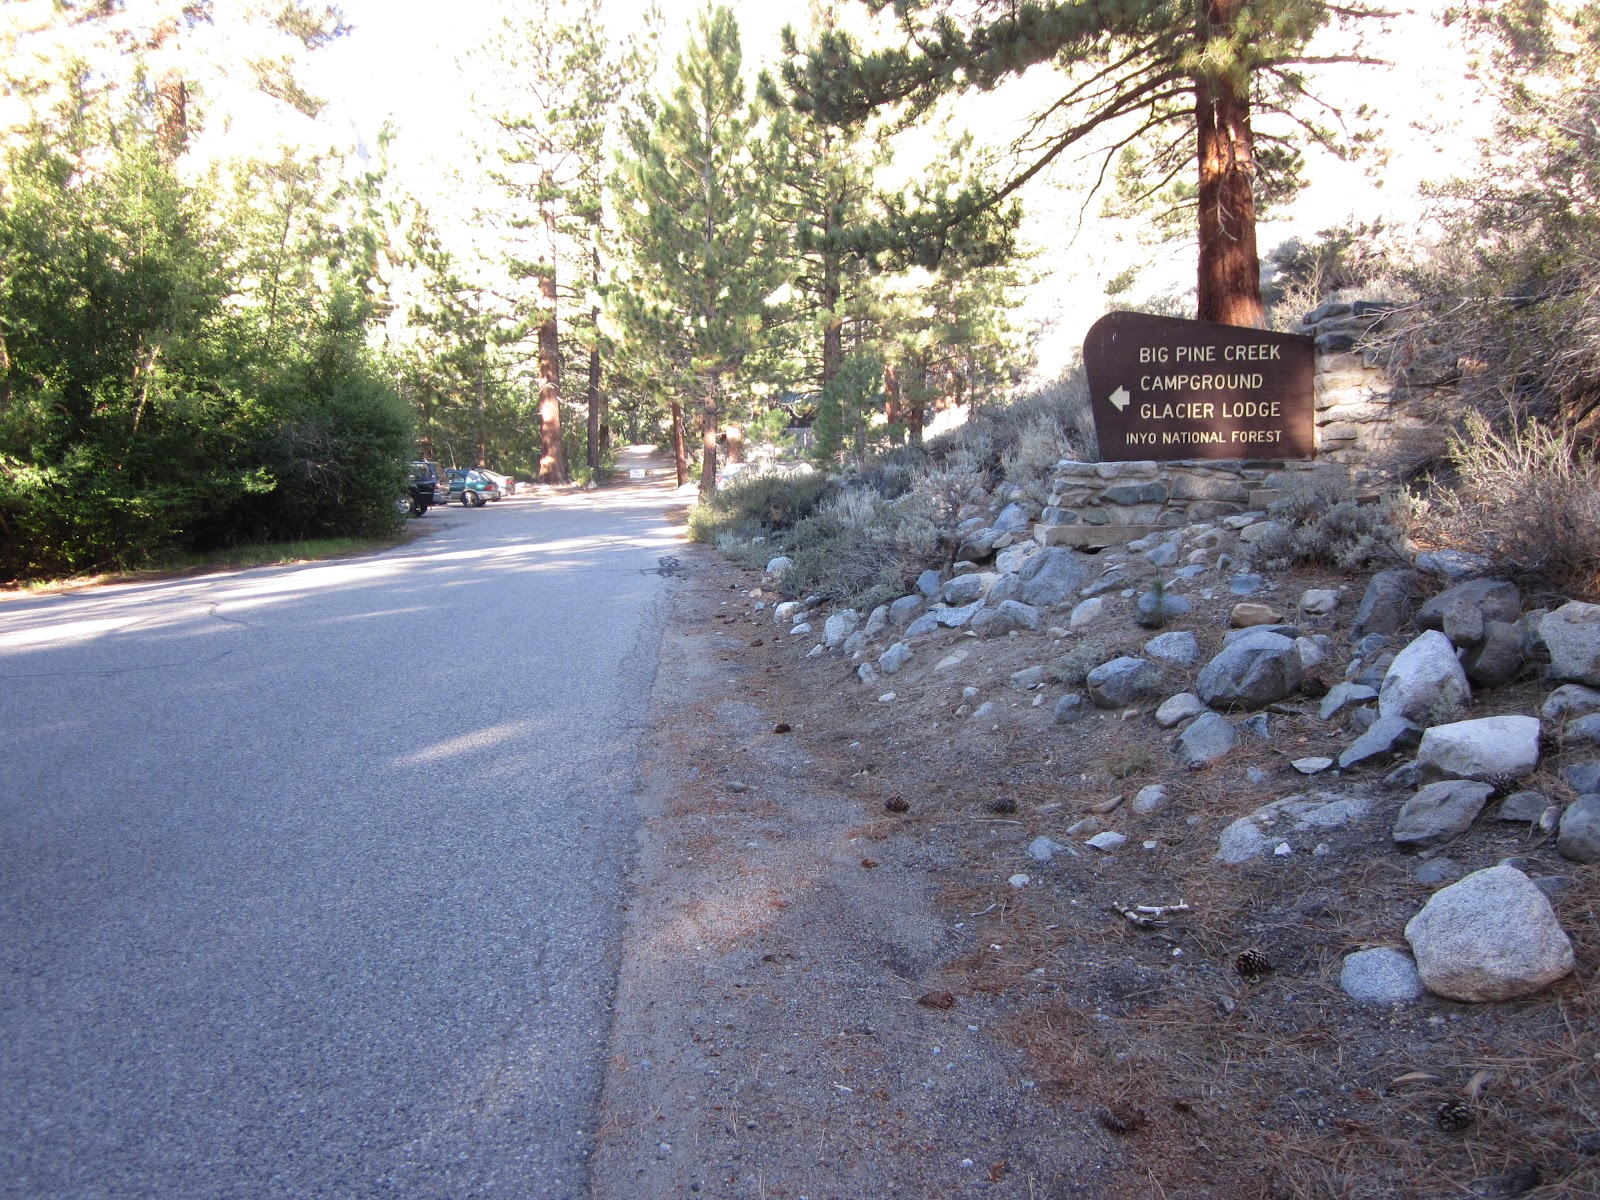 Biking Glacier Point Road - finish - park sign